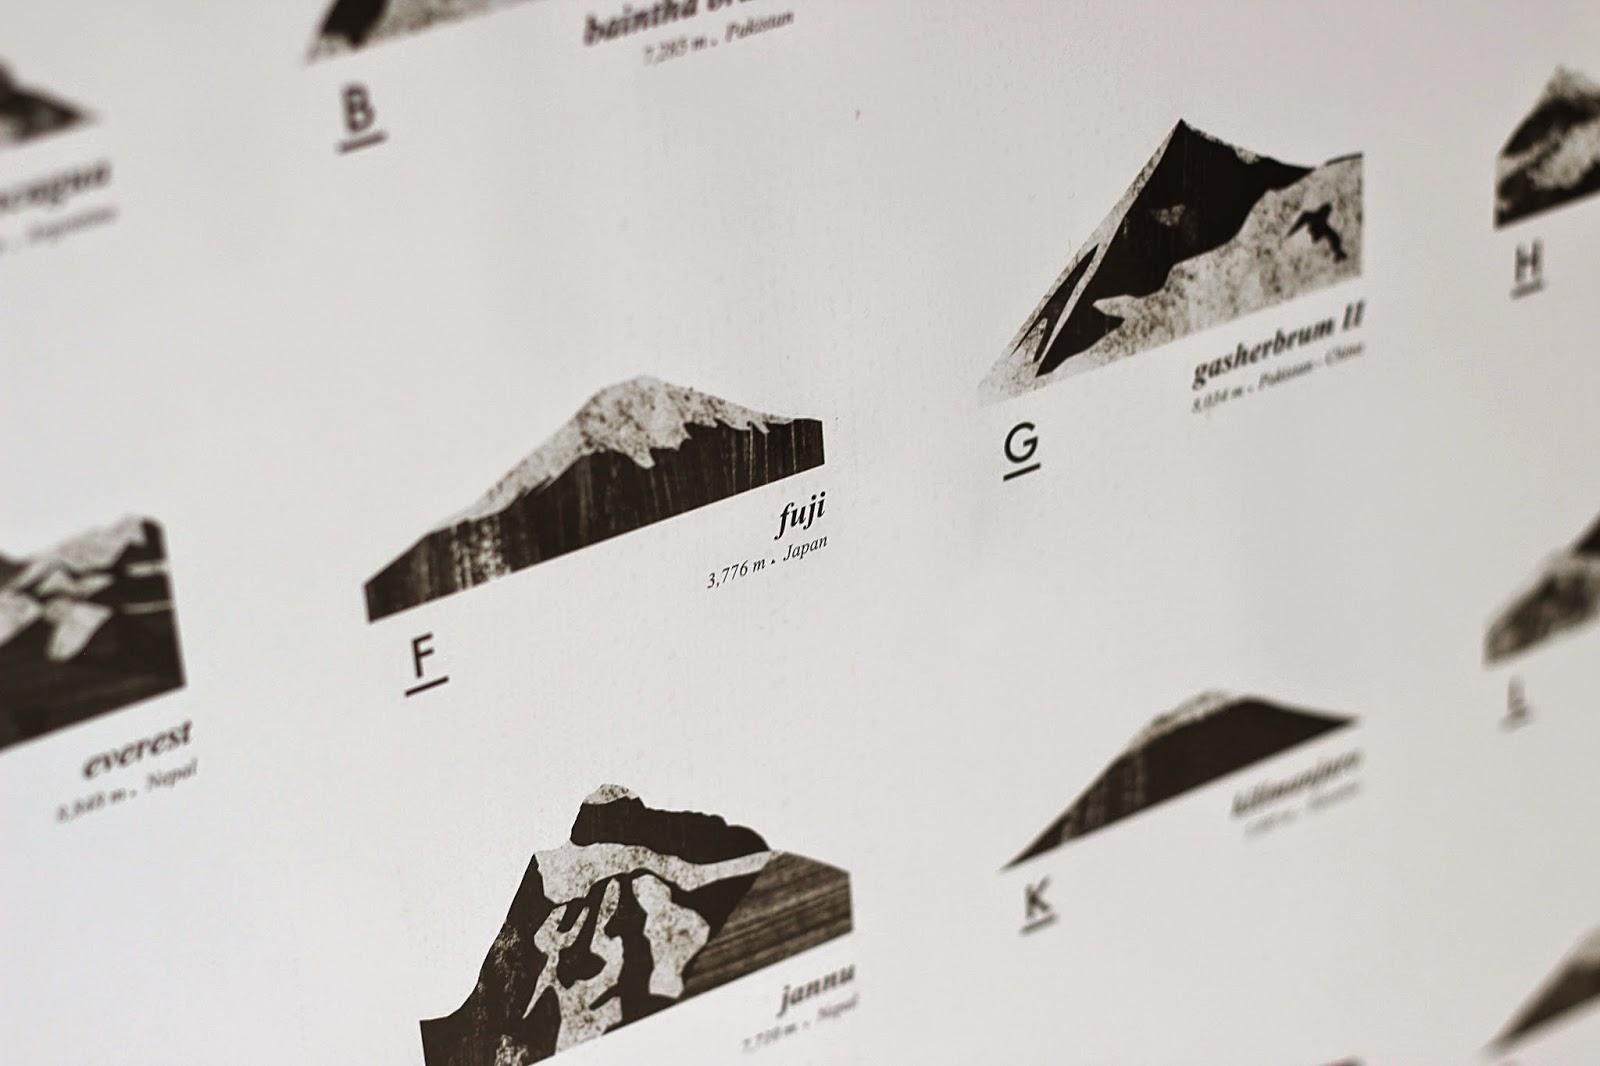 mountain abc, coco lapine design, scandinavian interior, pia wallen cross blanket, scandinavian love song